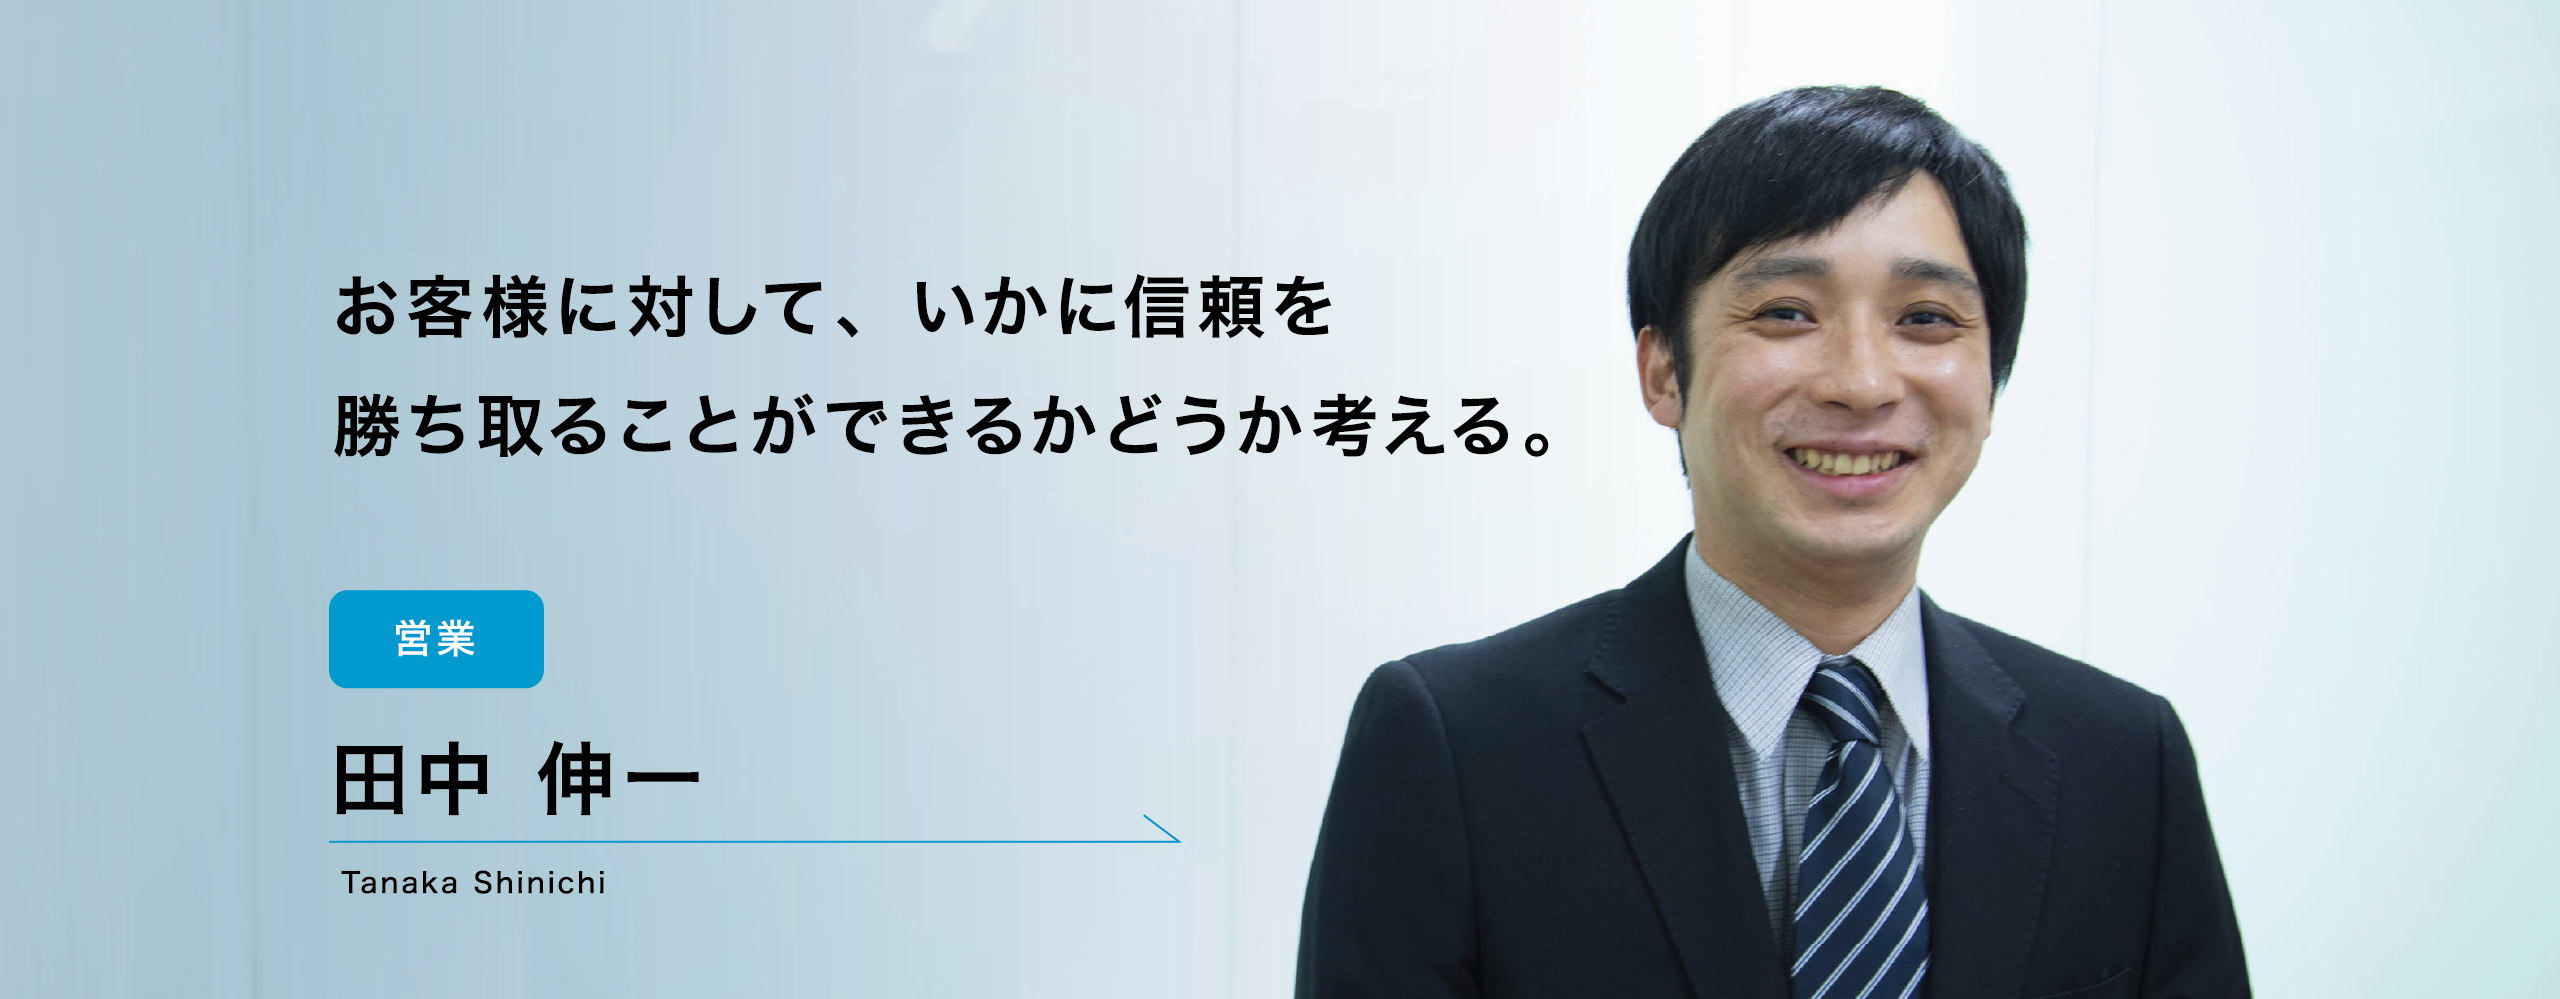 Shinichi Tanaka